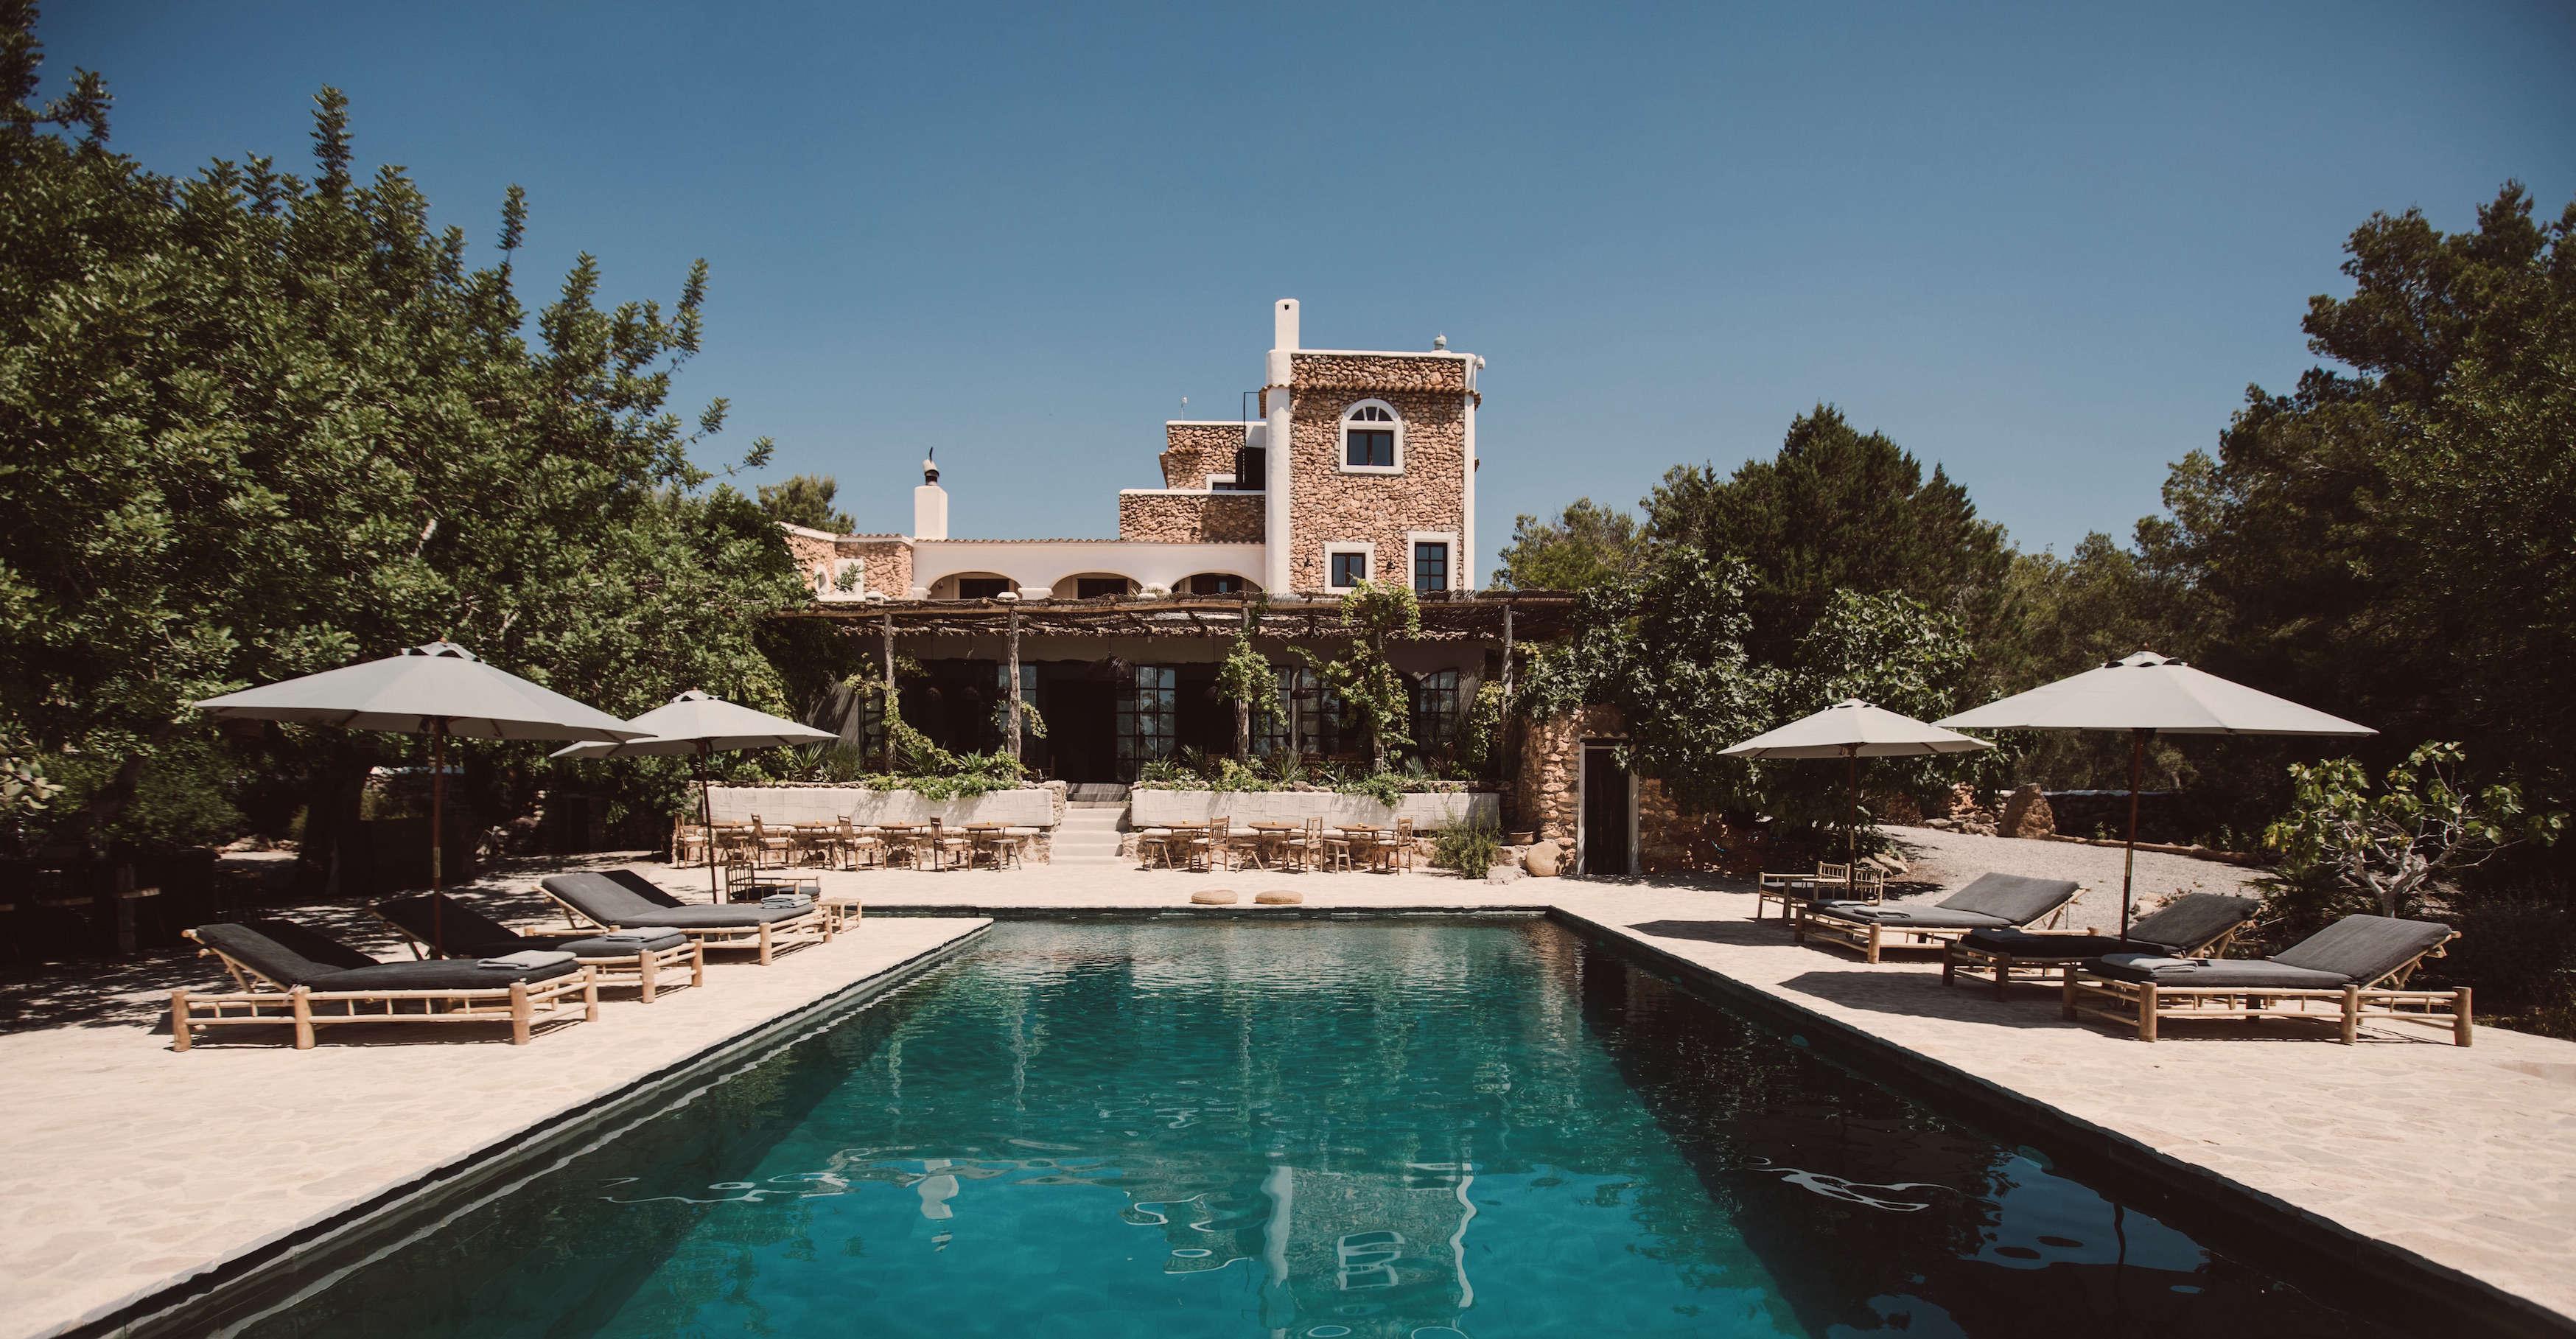 La Granja Ibiza, a Design Hotels retreat on a 16th century finca | Remodelista